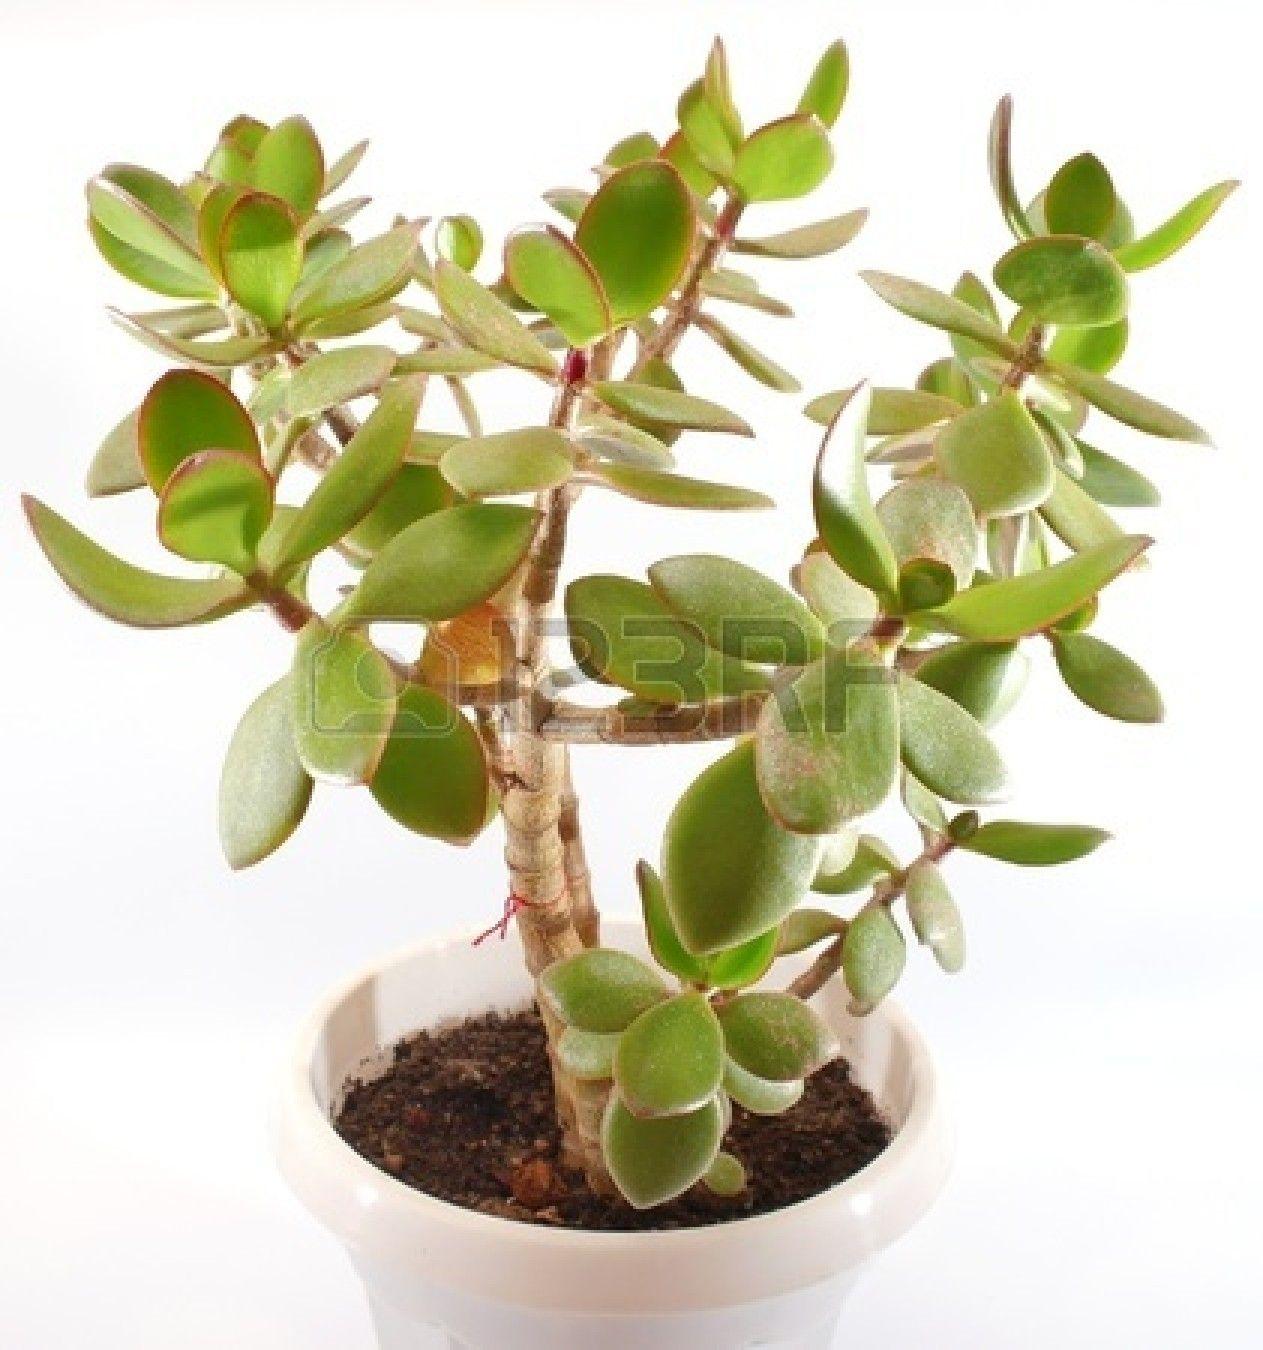 jade plant | Plants, Jade plants, Mural